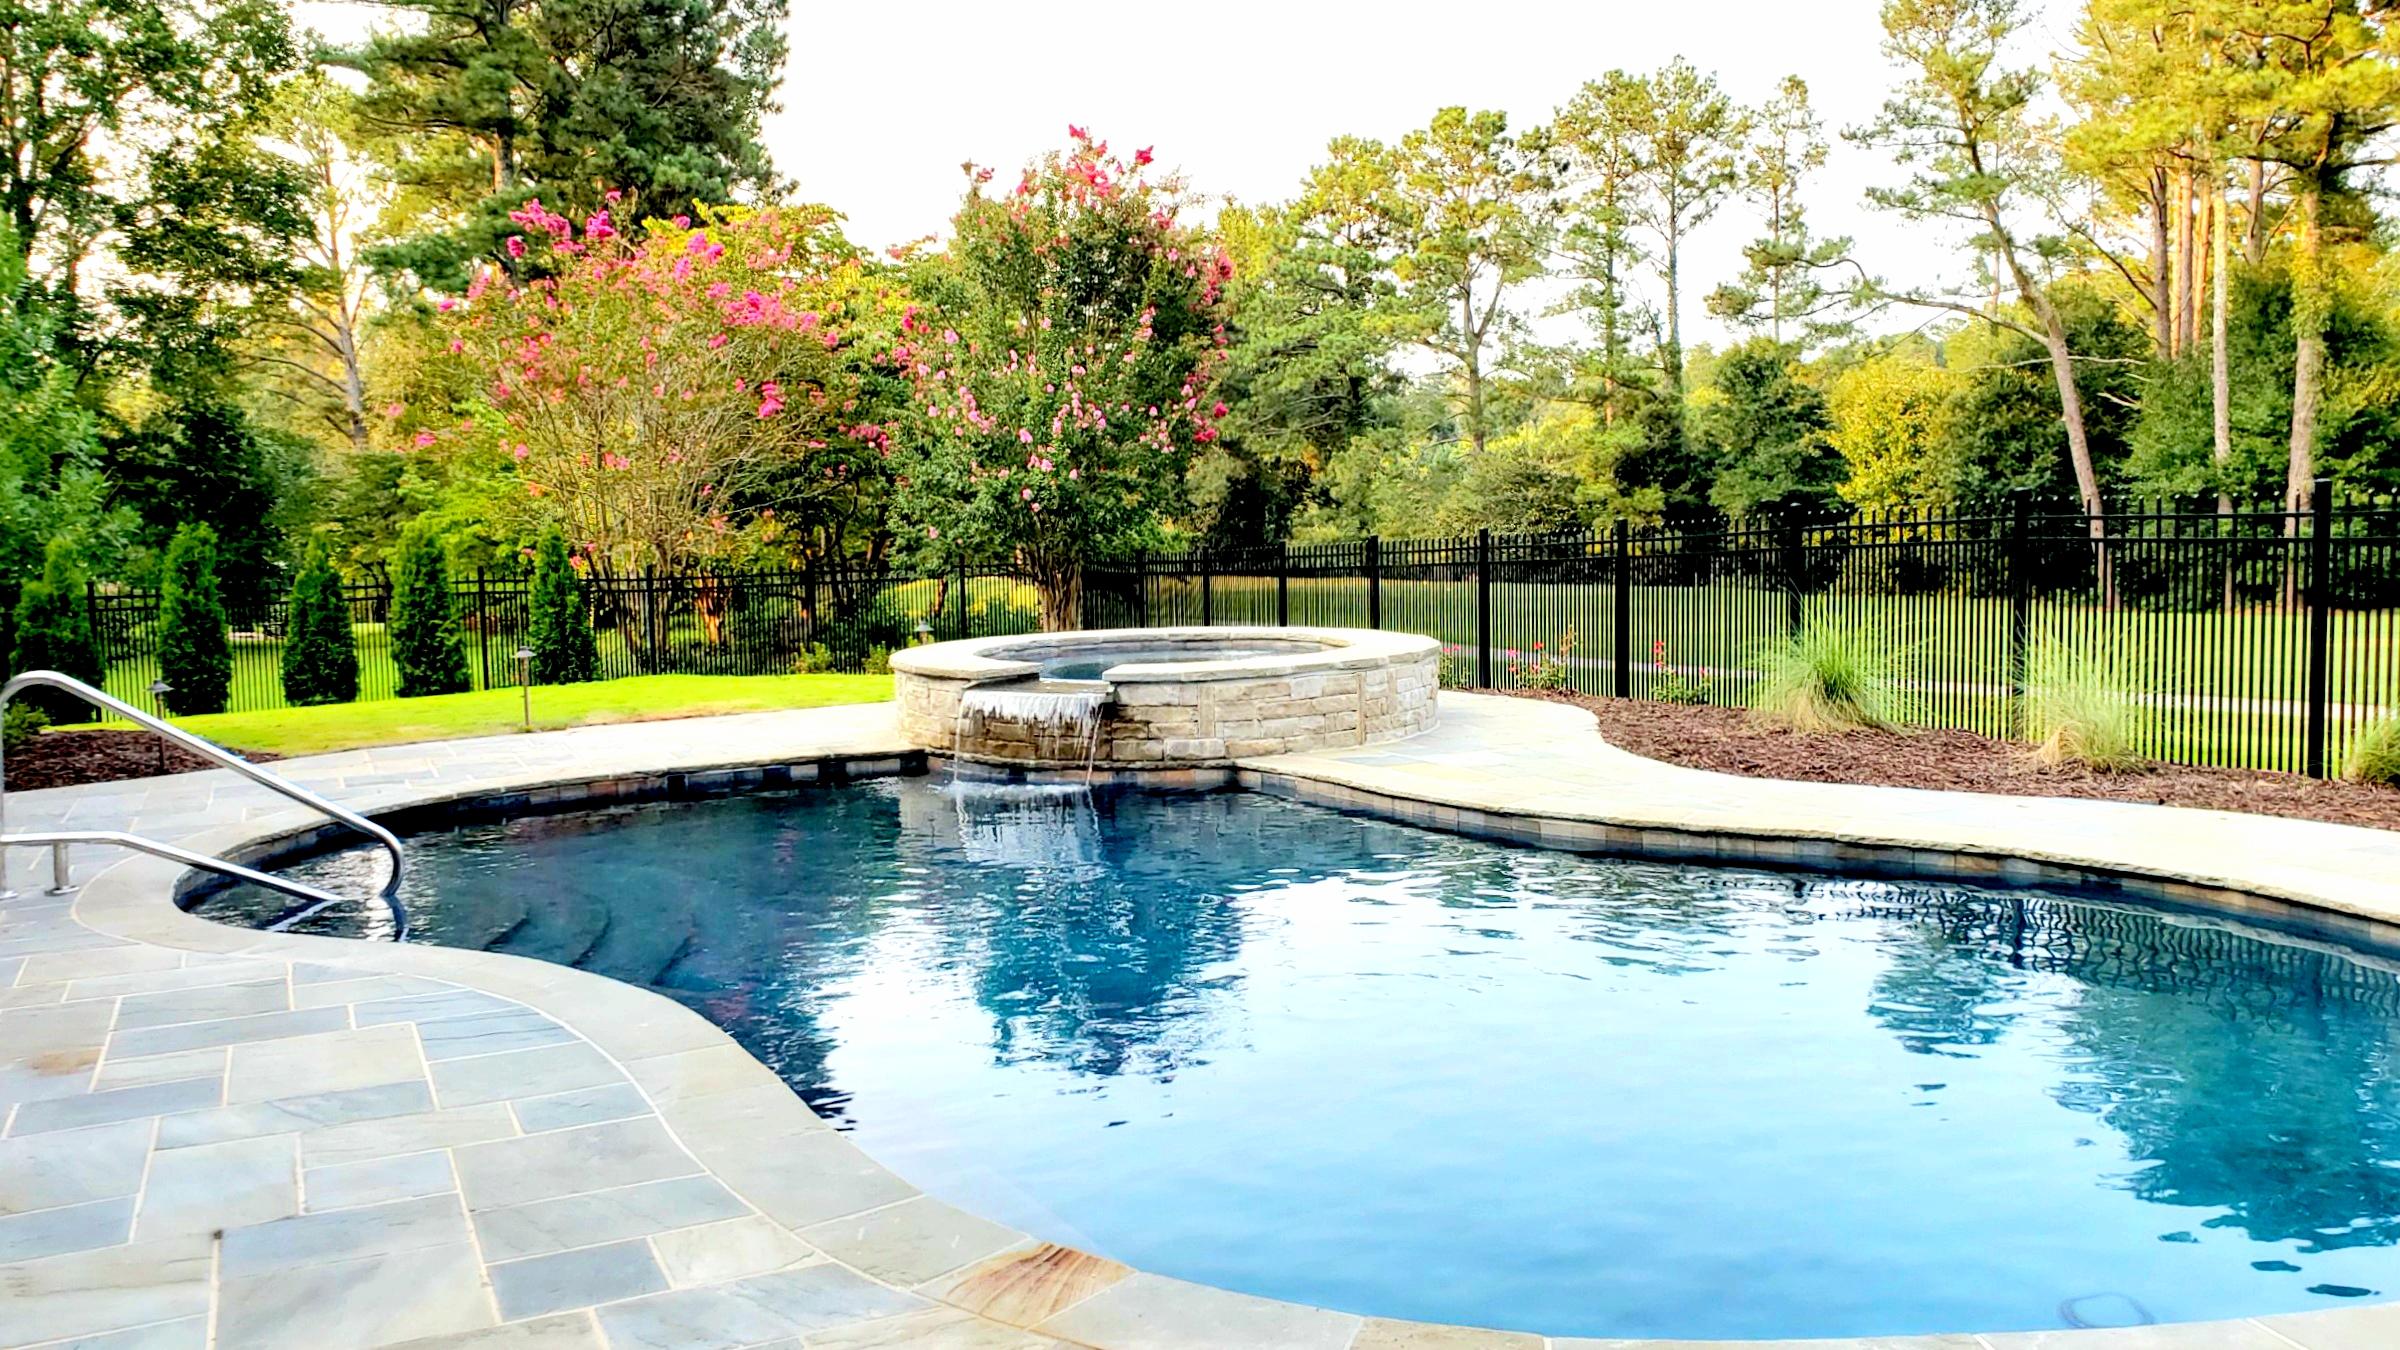 LUXE Homes Pro 016 pool spa bluestone patio.jpg